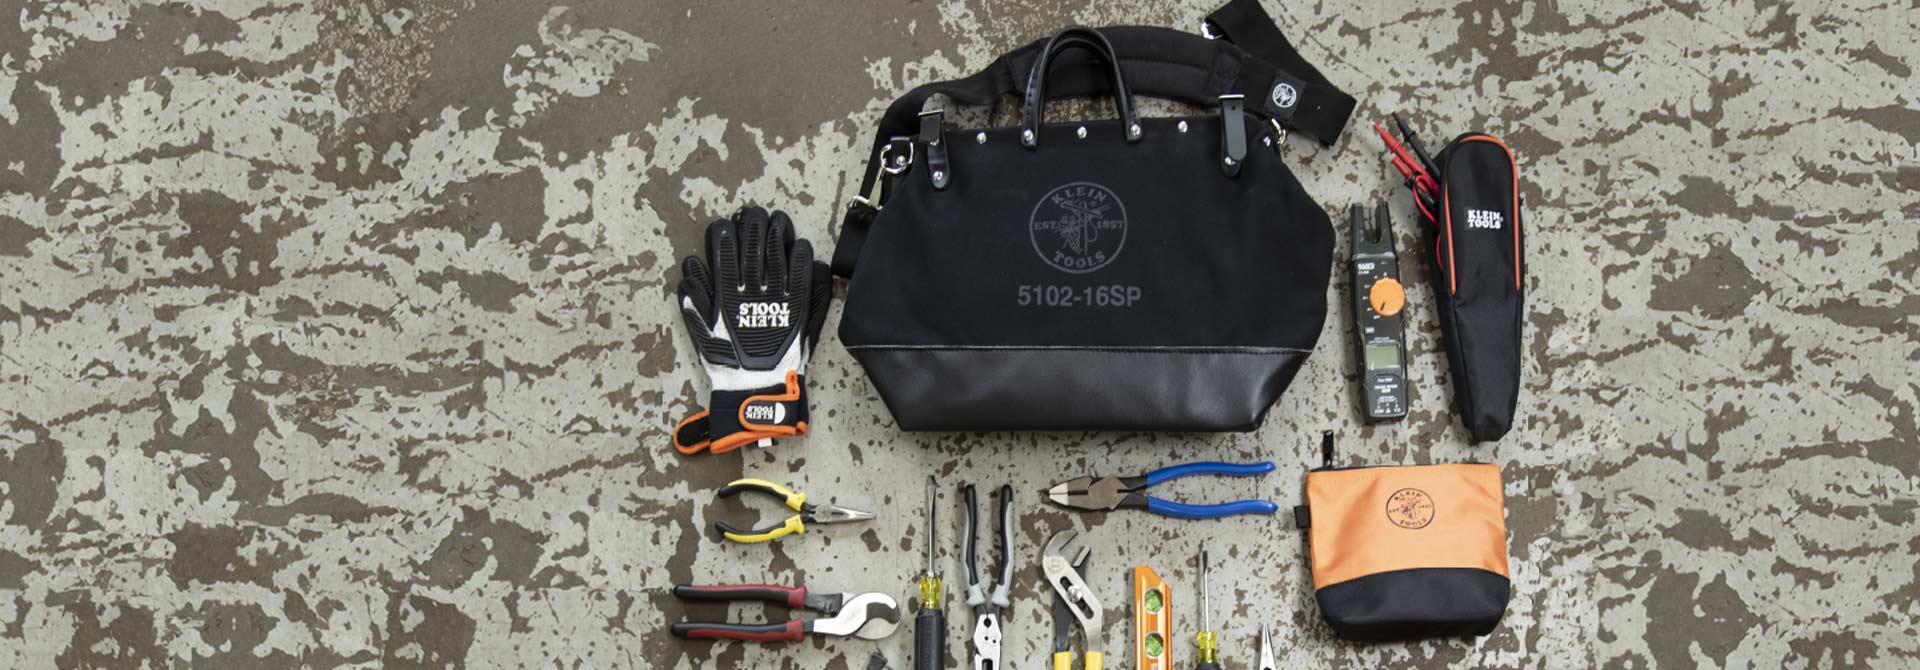 Win $1,000 in\r\nKlein Tools\r\nand a Custom\r\nTool Bag*